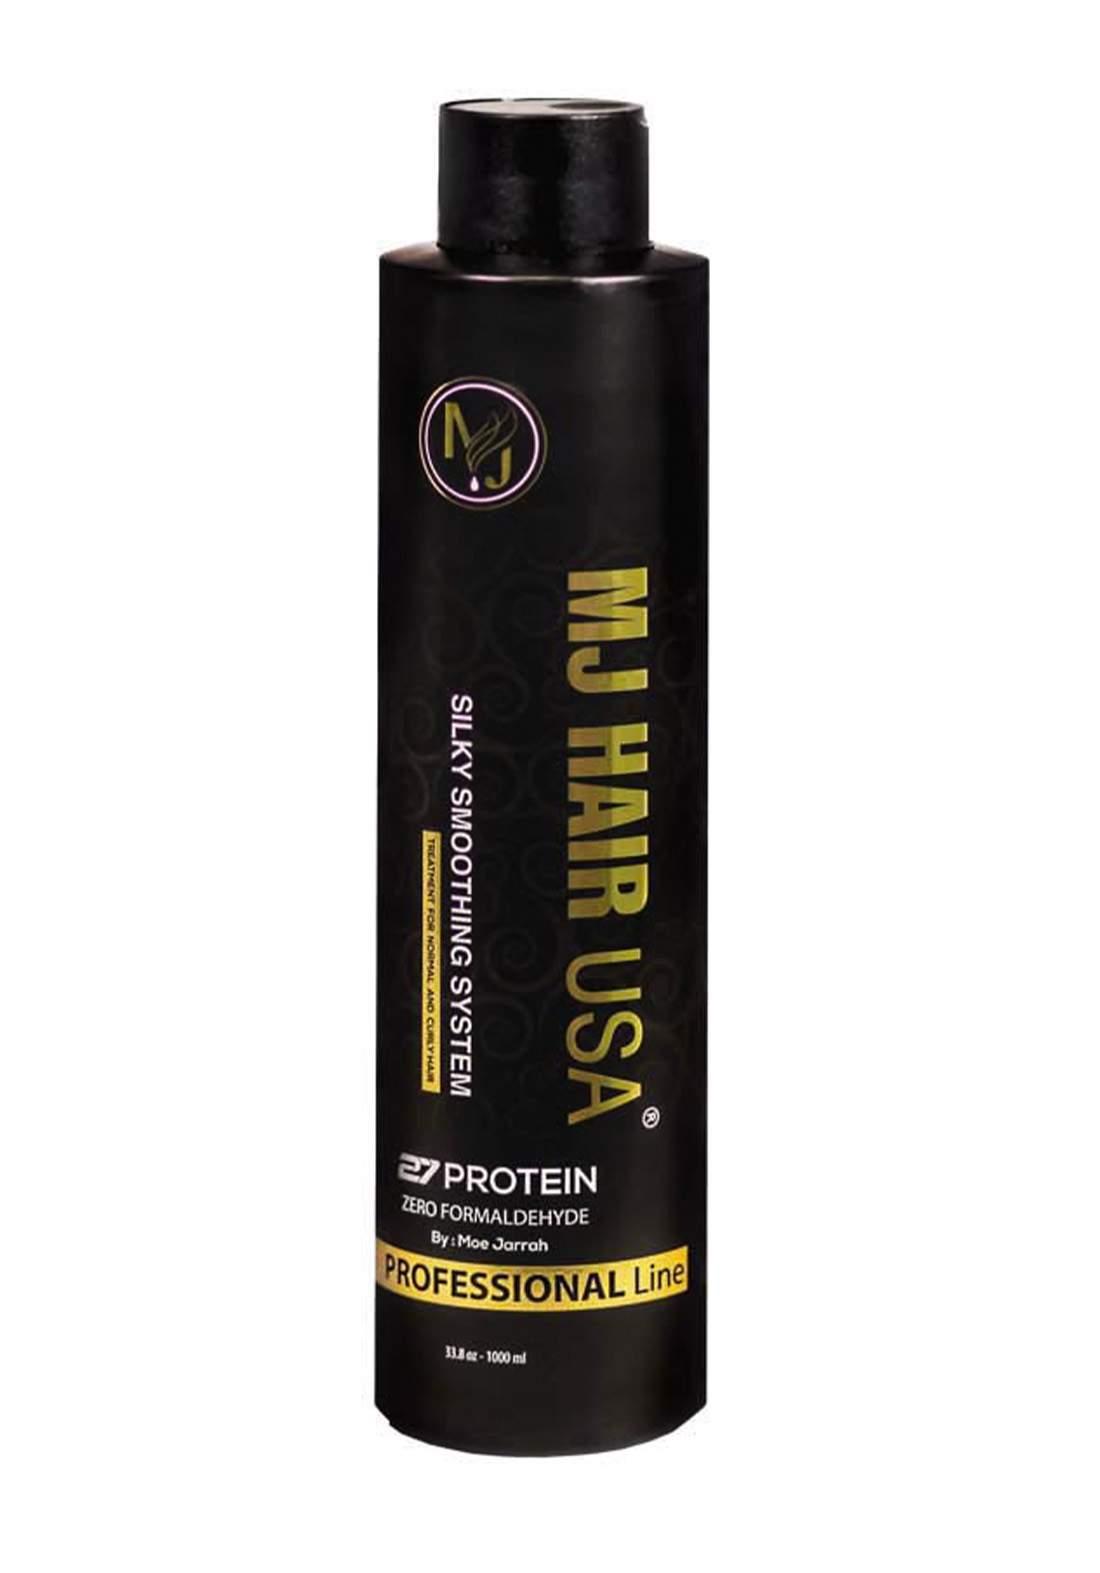 MJ Hair Silky Smoothing System 27 Protein Zero Formaldehyde 1000ml  مسرح للشعر